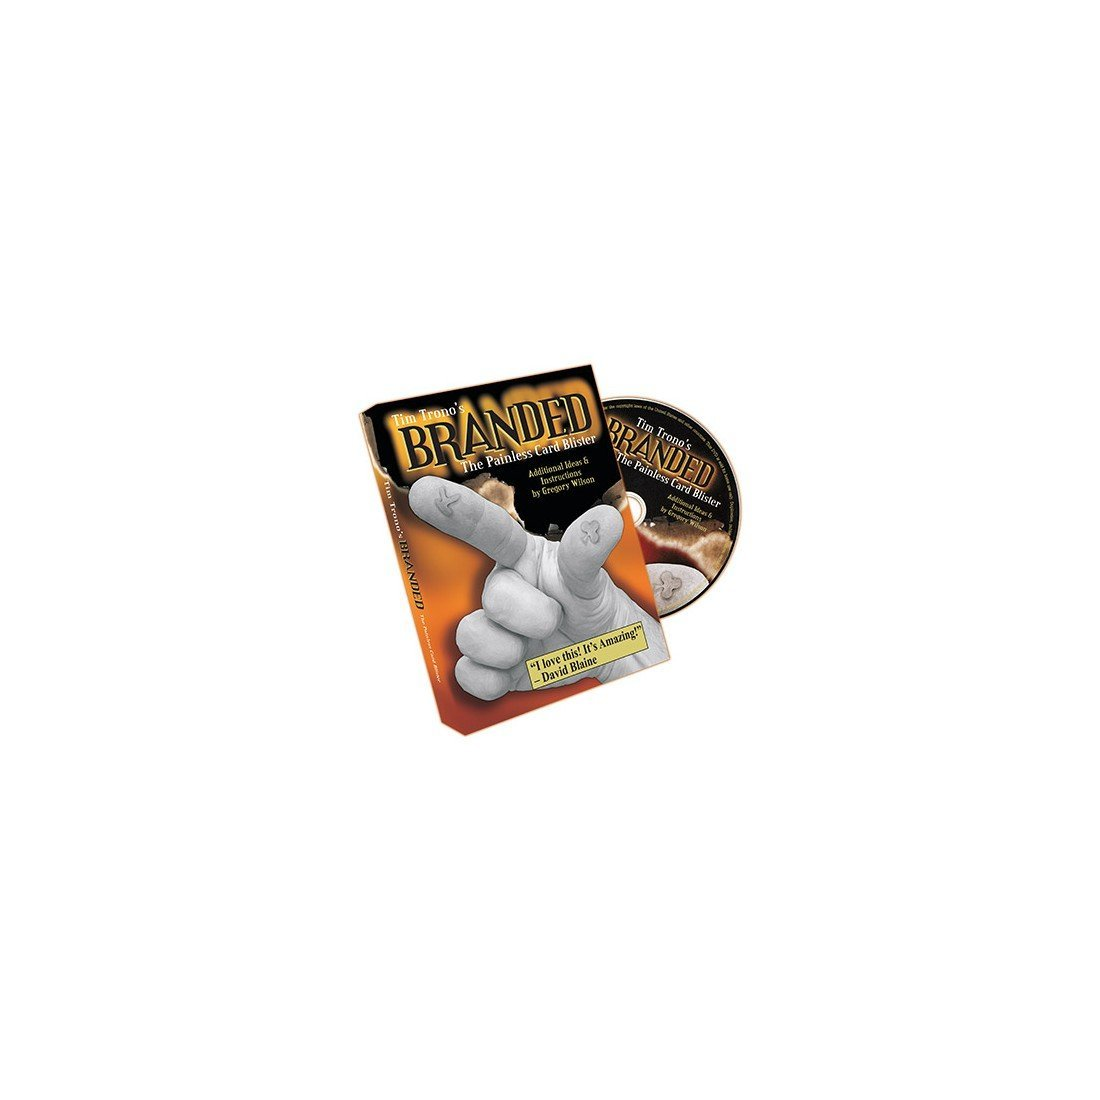 Amazon.com: Branded (Mini and Regular Bic Gimmicks and DVD) by Tim Trono: Movies & TV